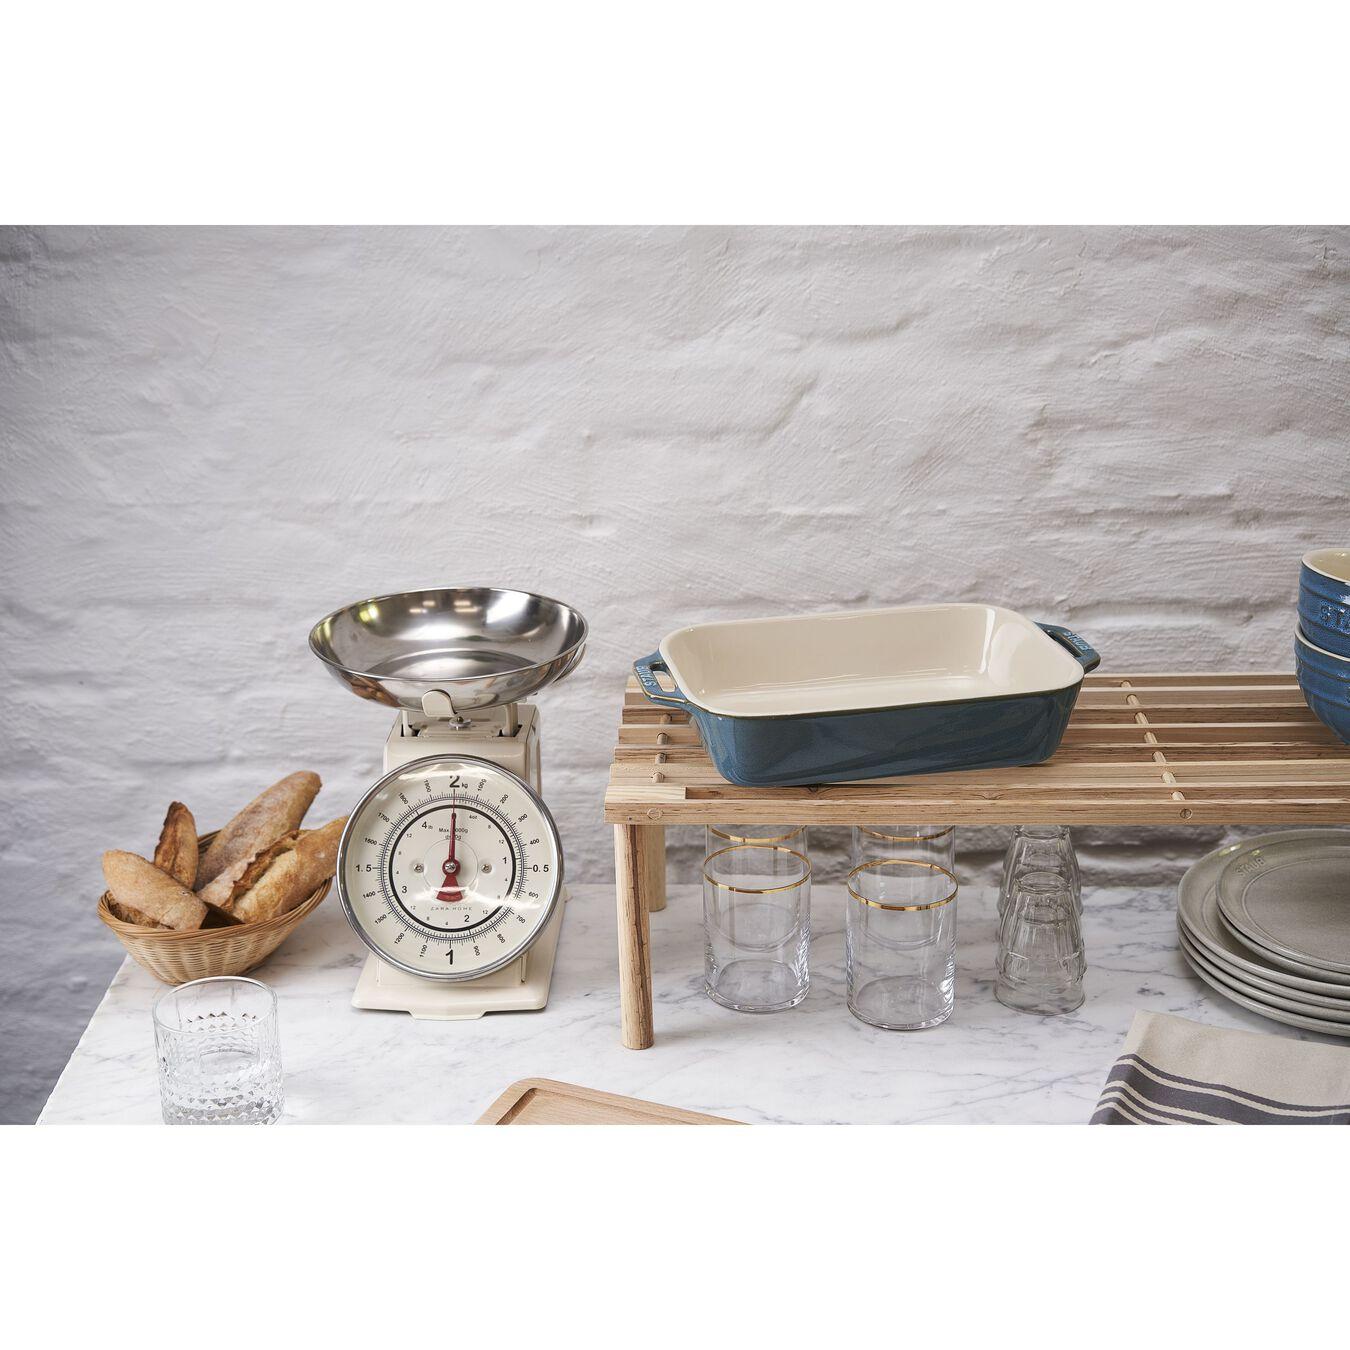 10.5-inch x 7.5-inch Rectangular Baking Dish - Rustic Turquoise,,large 5